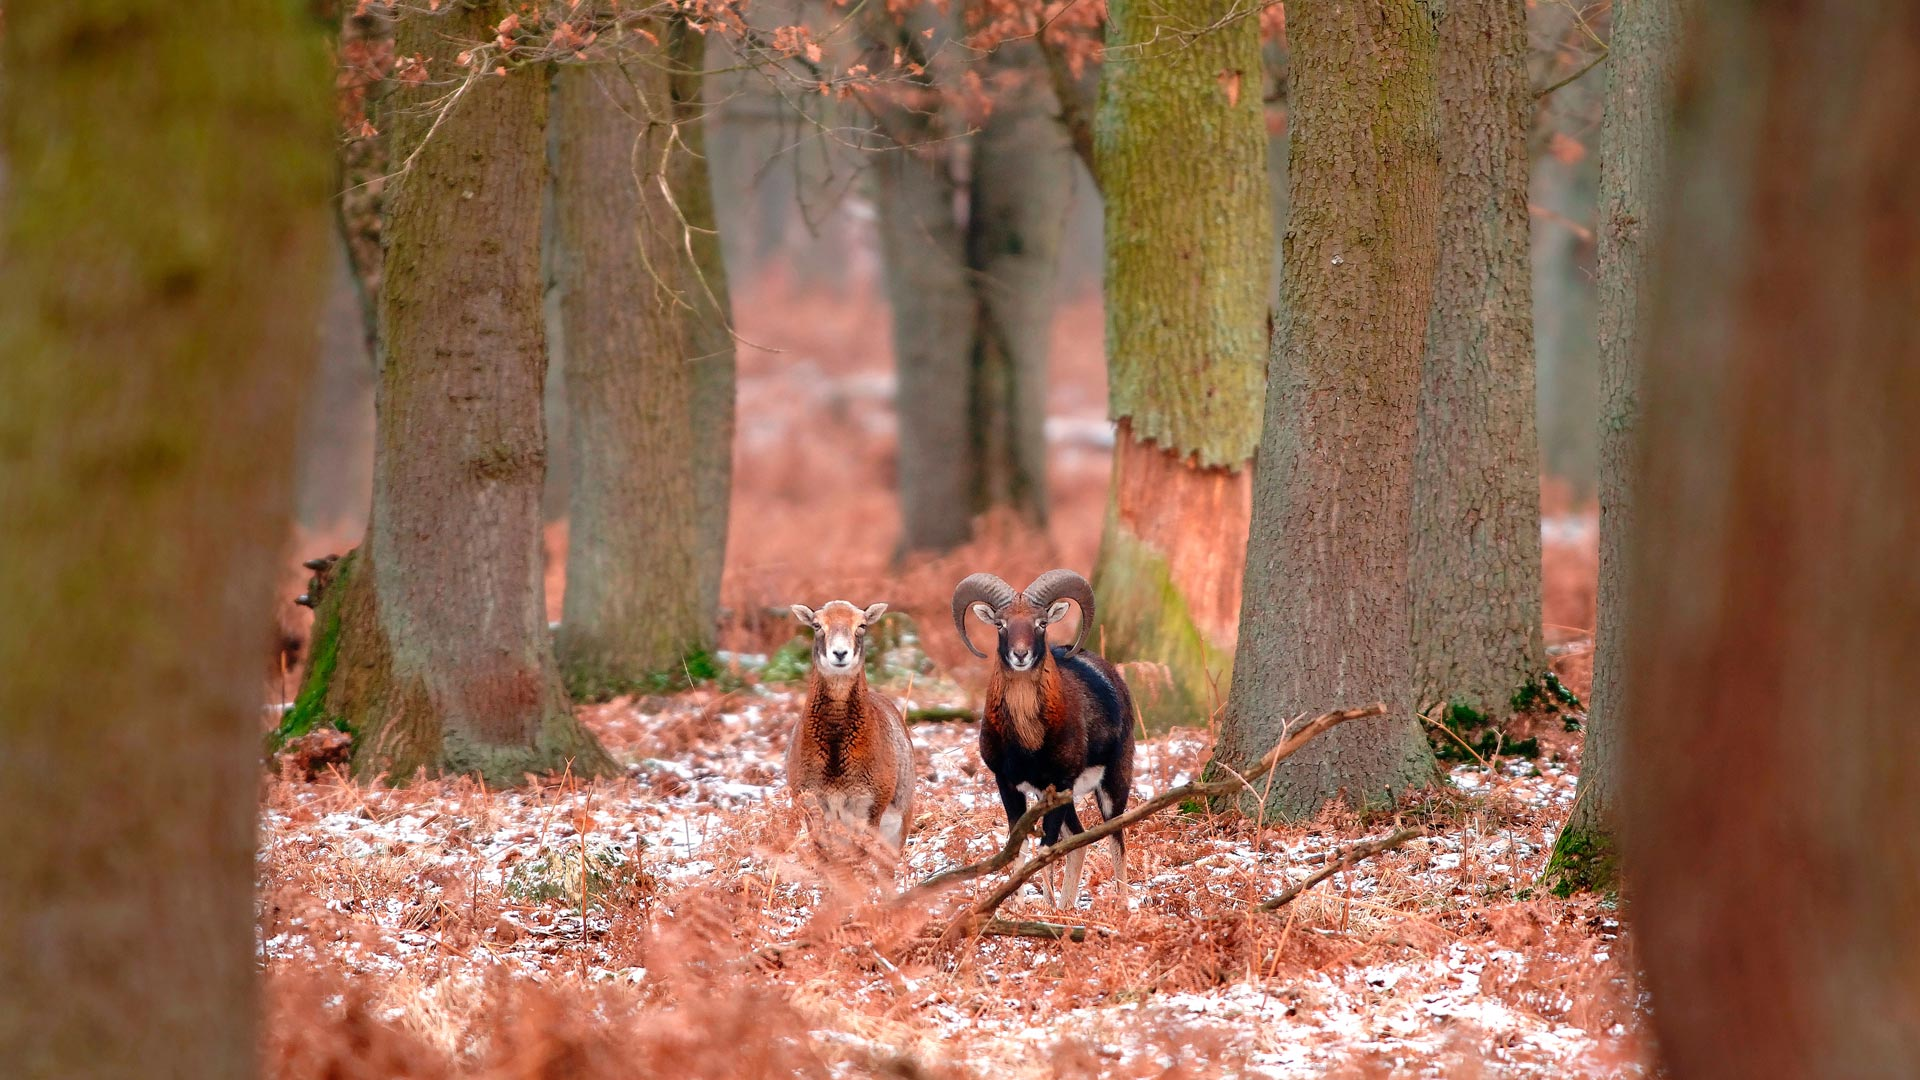 Mouflons Forest Bing Wallpaper Download 1920x1080